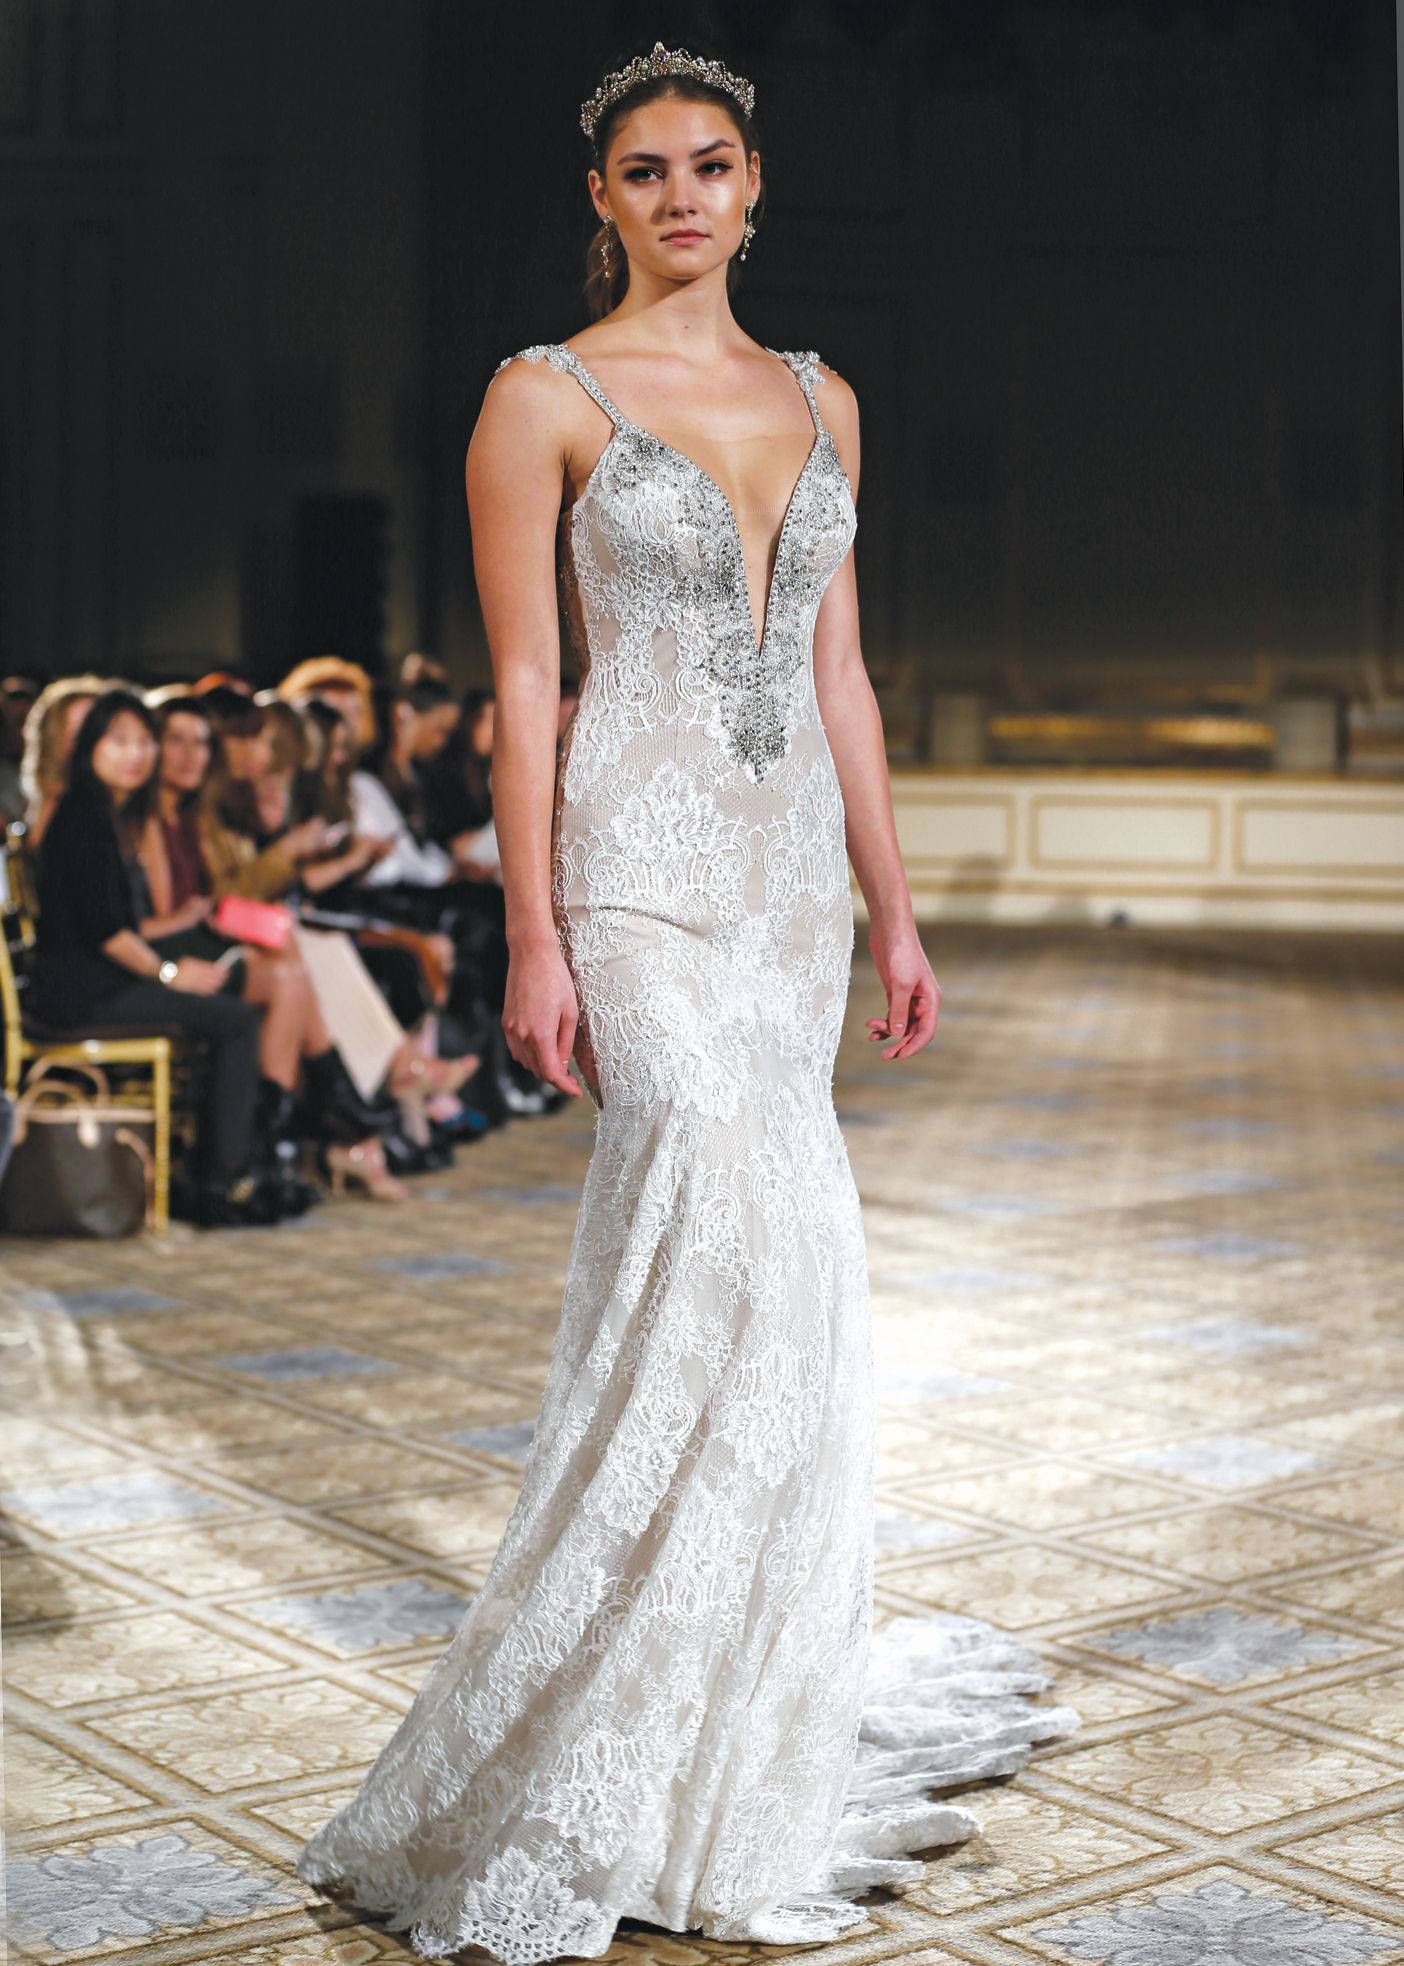 Berta Spaghetti Strap Fit-to-Flare Wedding Gown NY, NJ